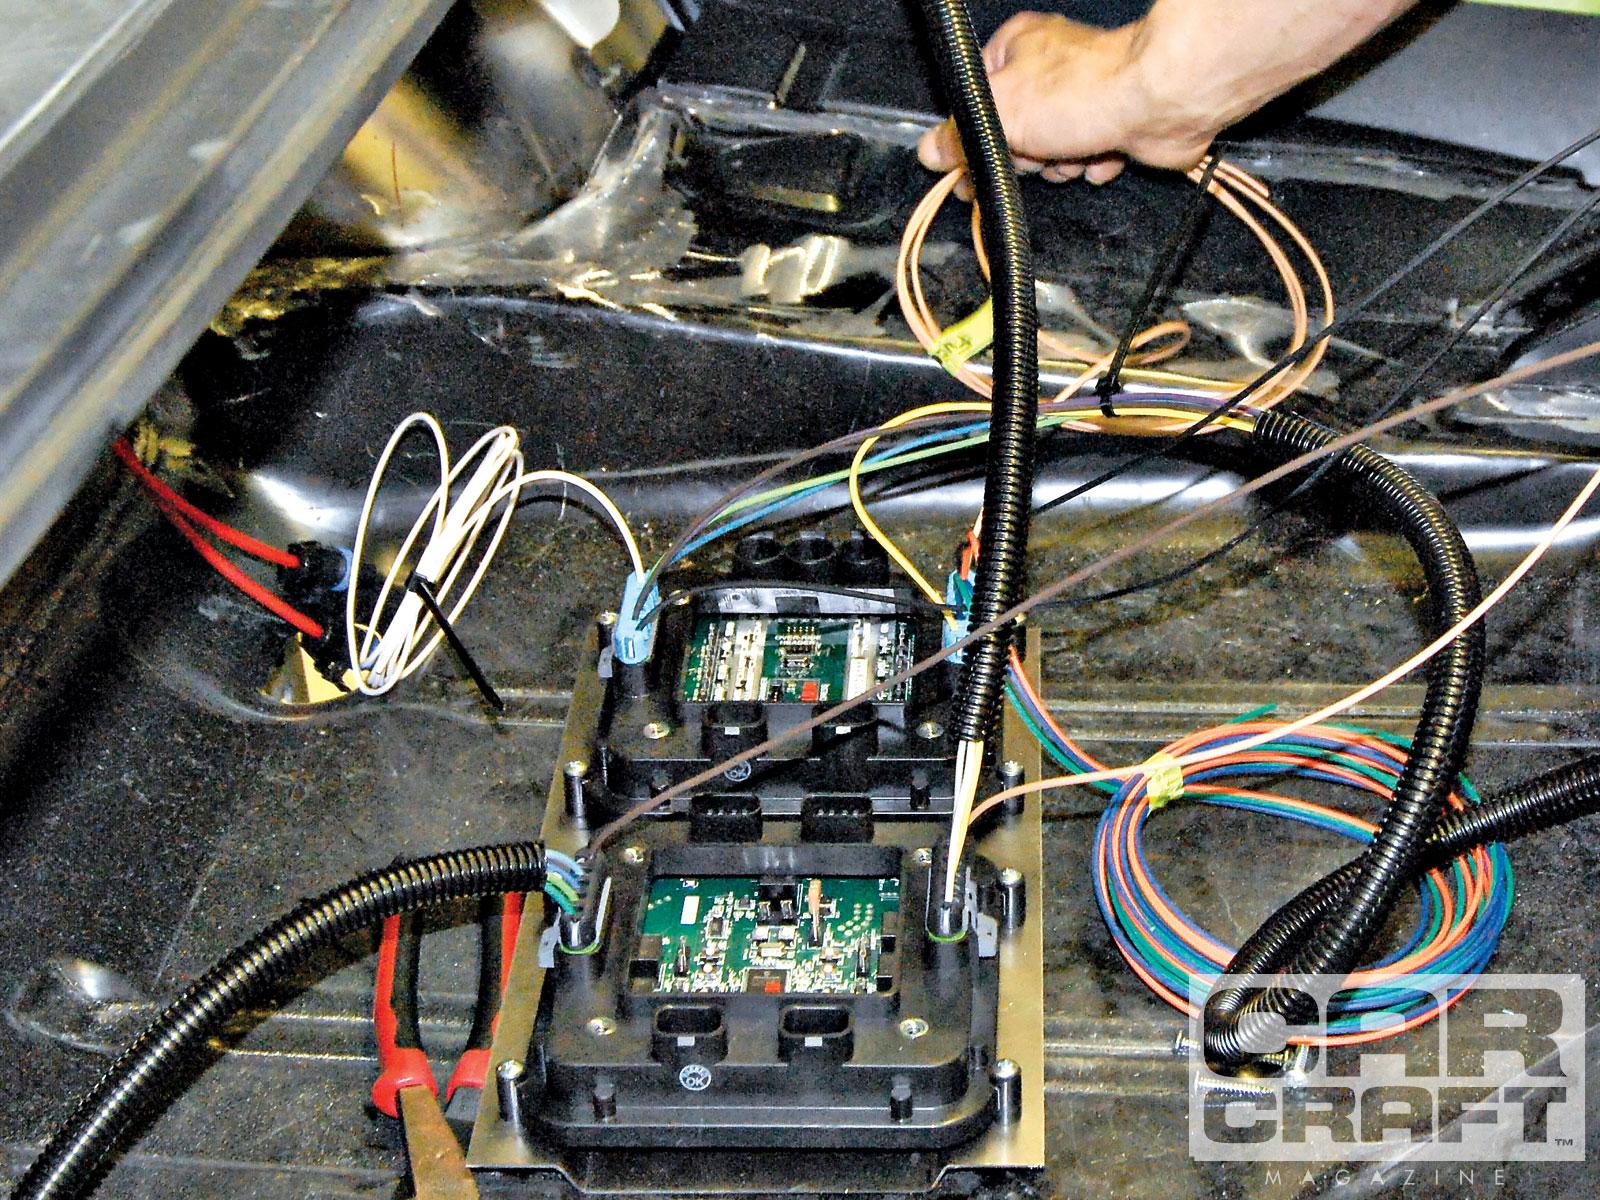 medium resolution of drag car wiring harness wiring source u2022 drag racing air ducts drag racing wiring harnesses